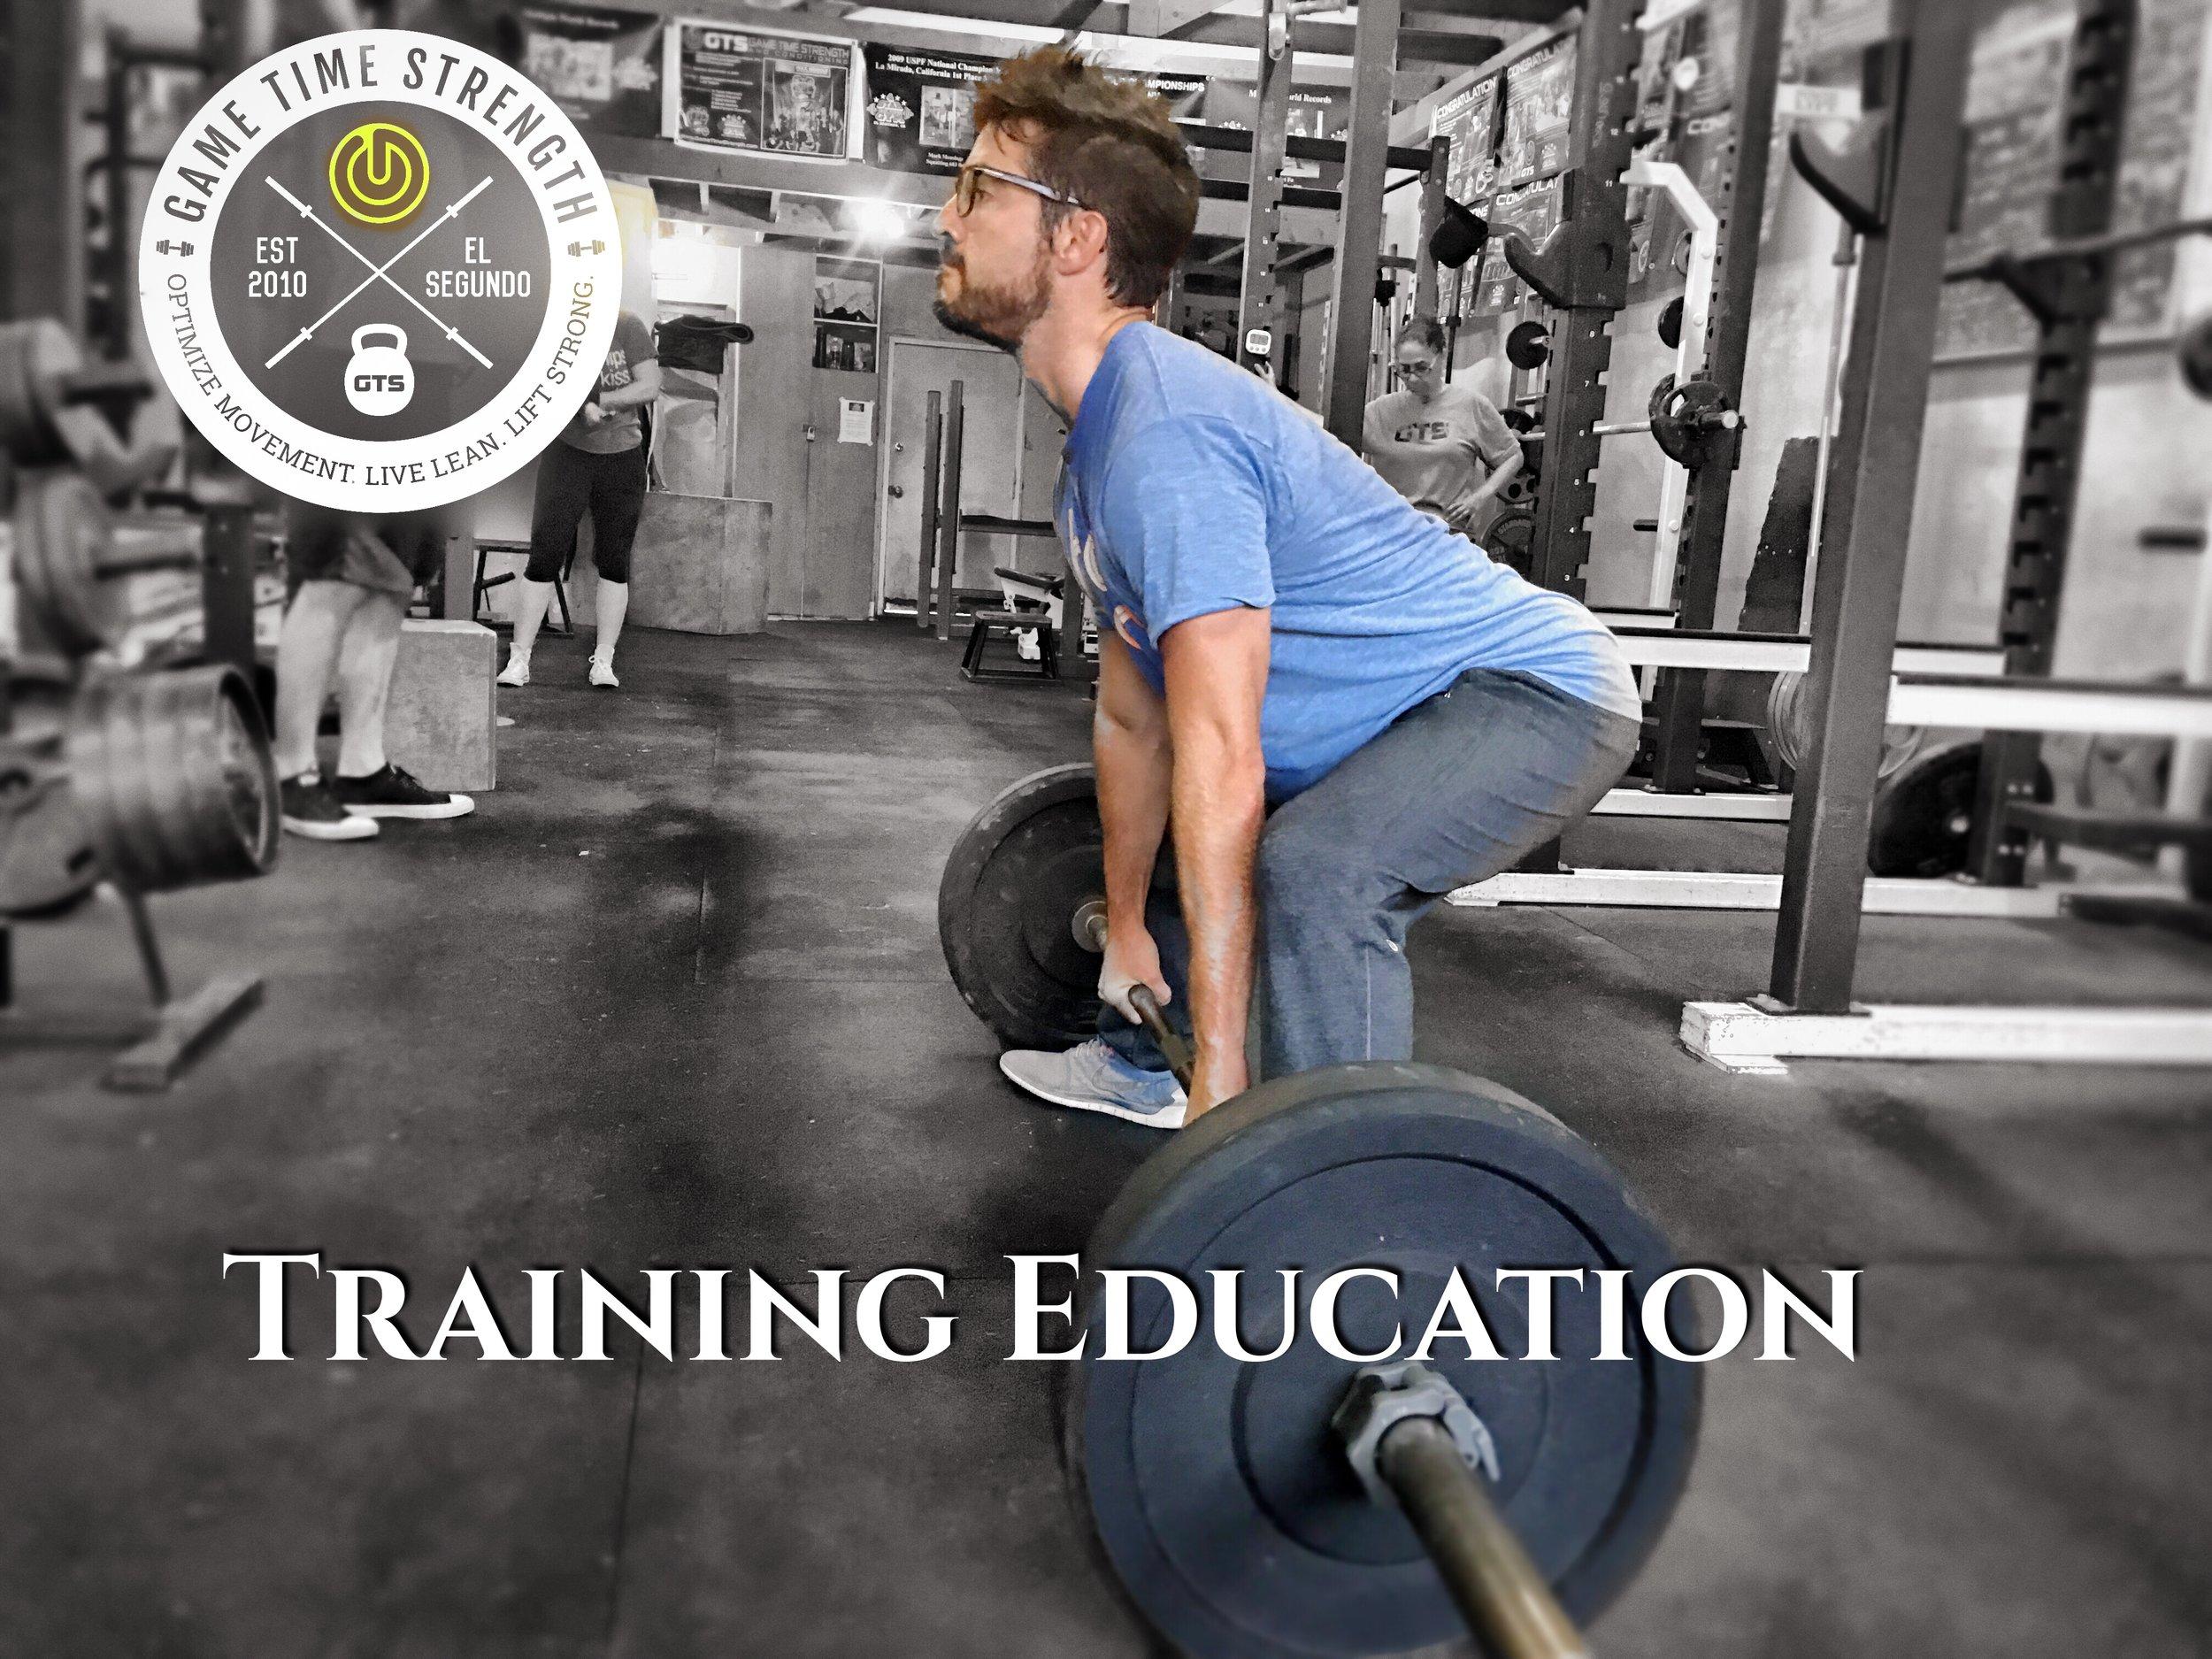 Training Education - JB - Game Time Strength GTS Best Los Angeles Strength Barbell Training El Segundo.JPG